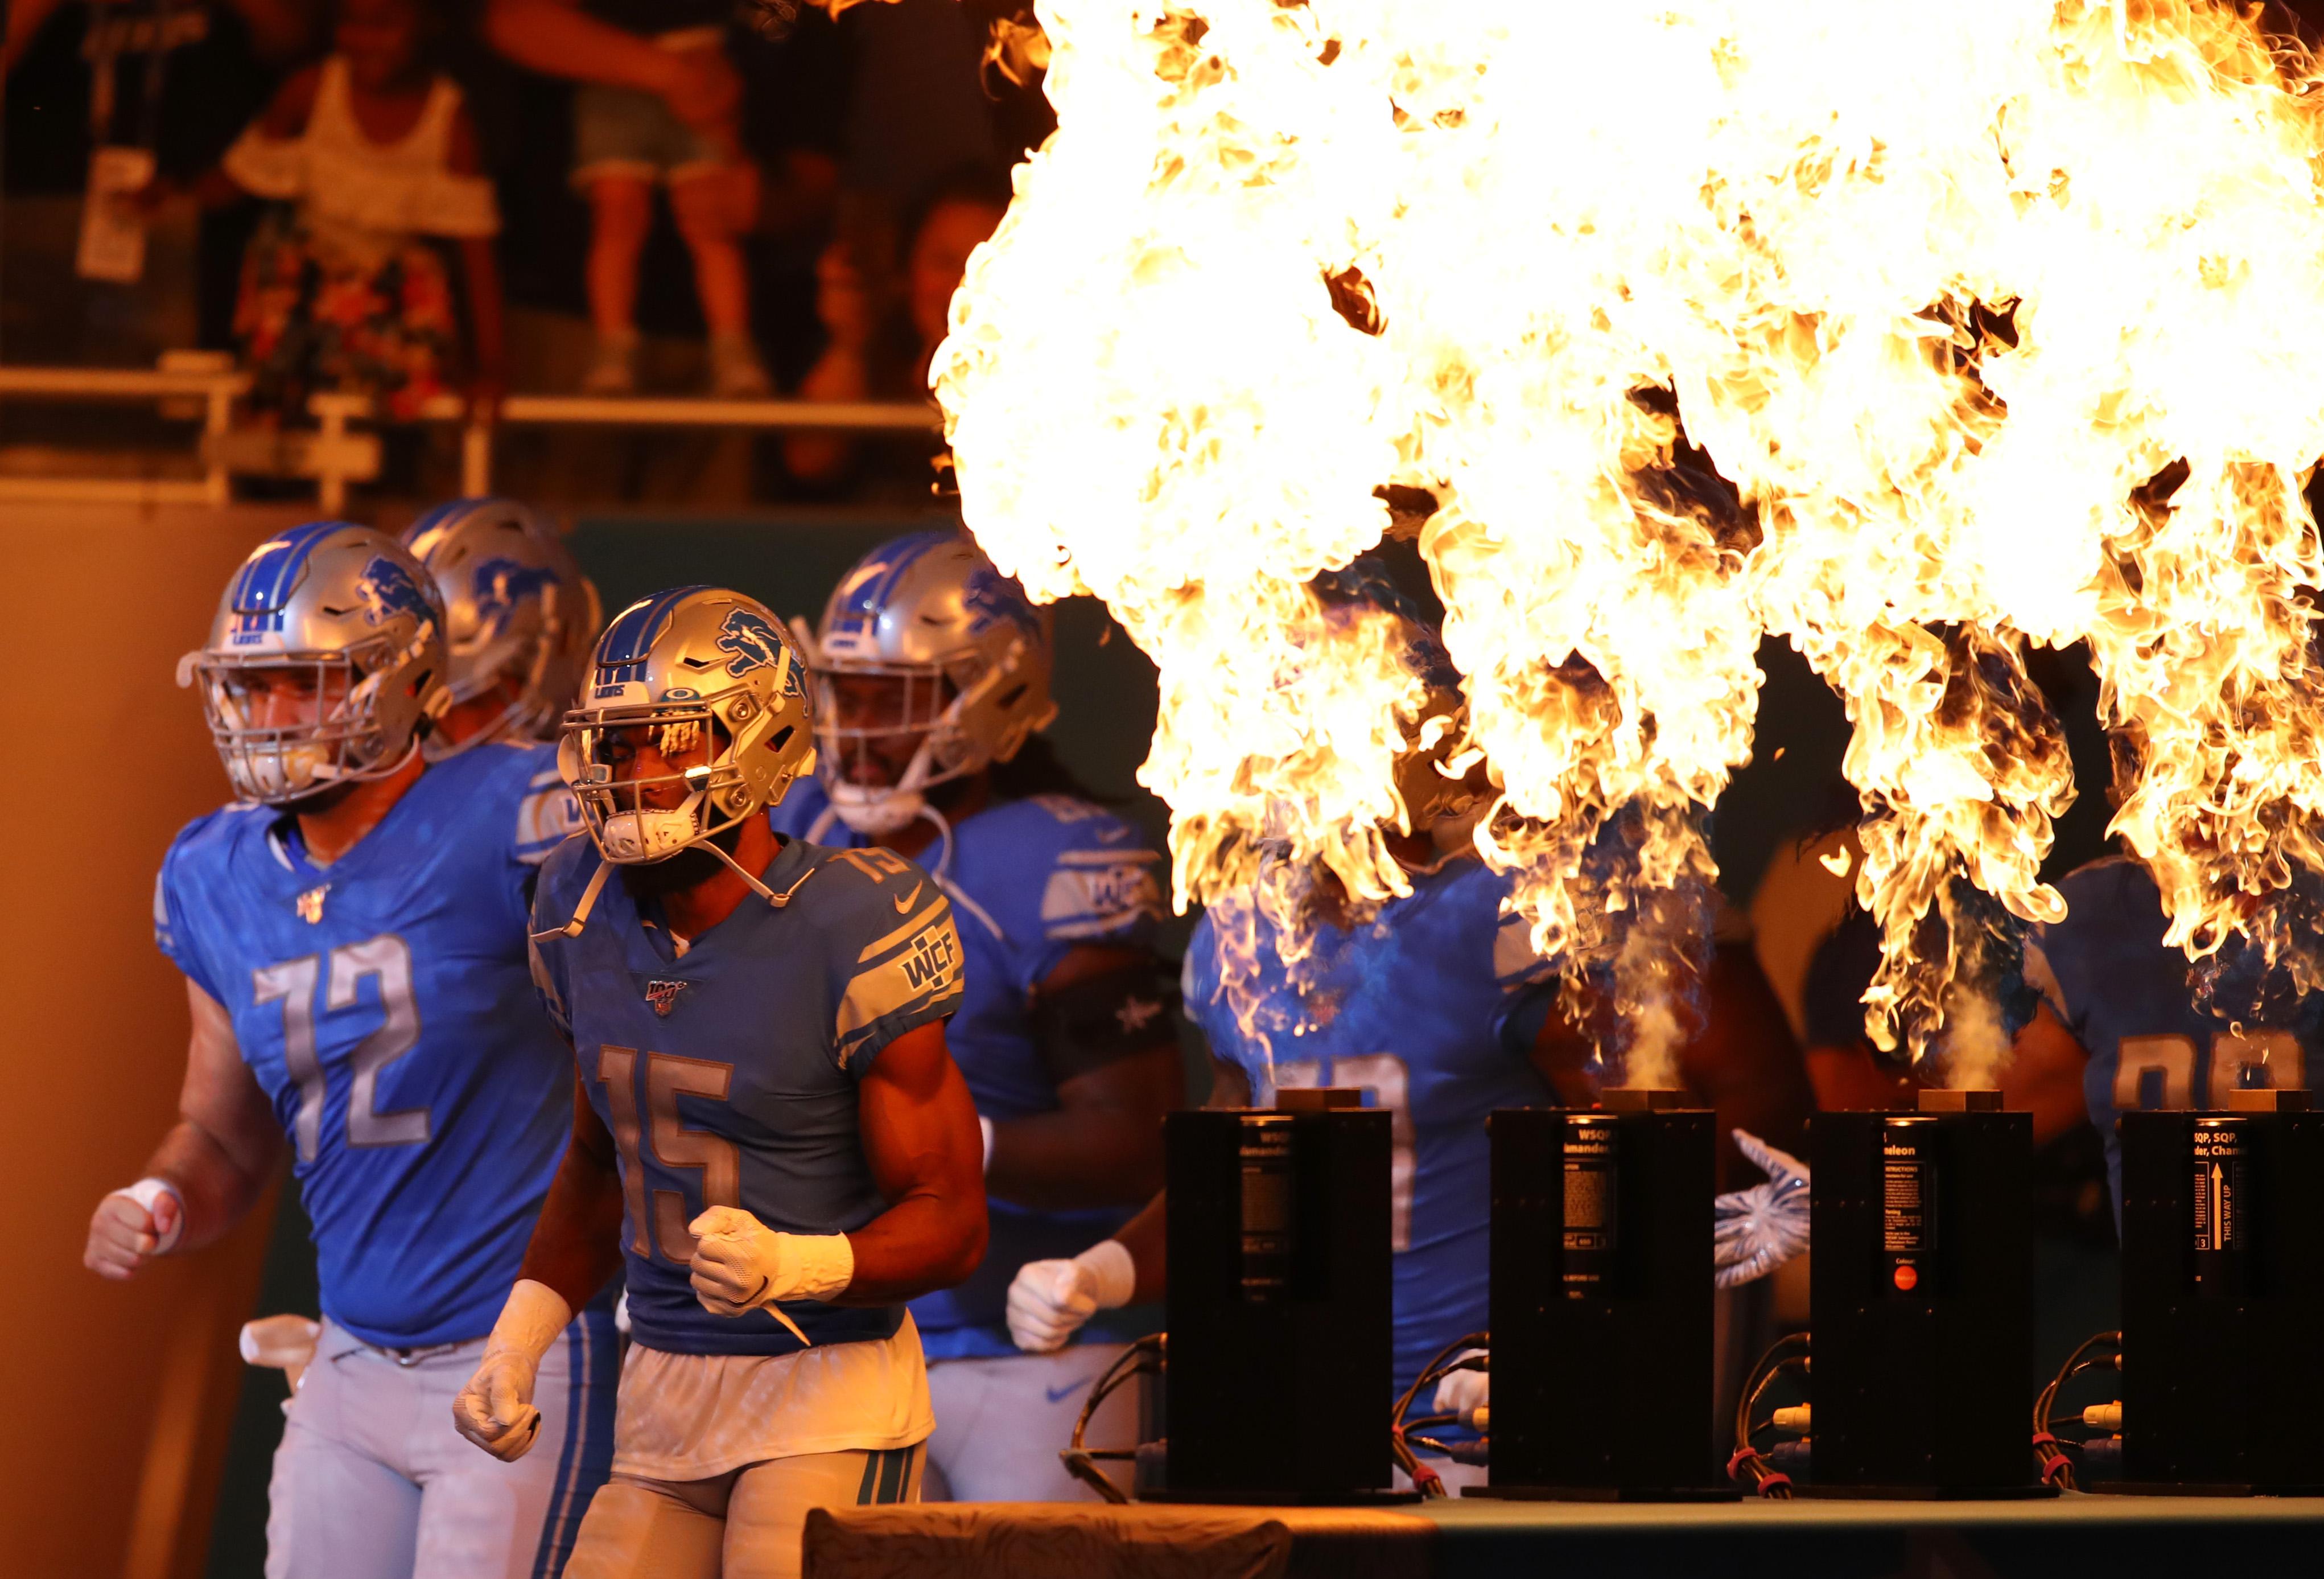 New England Patriots v Detroit Lions